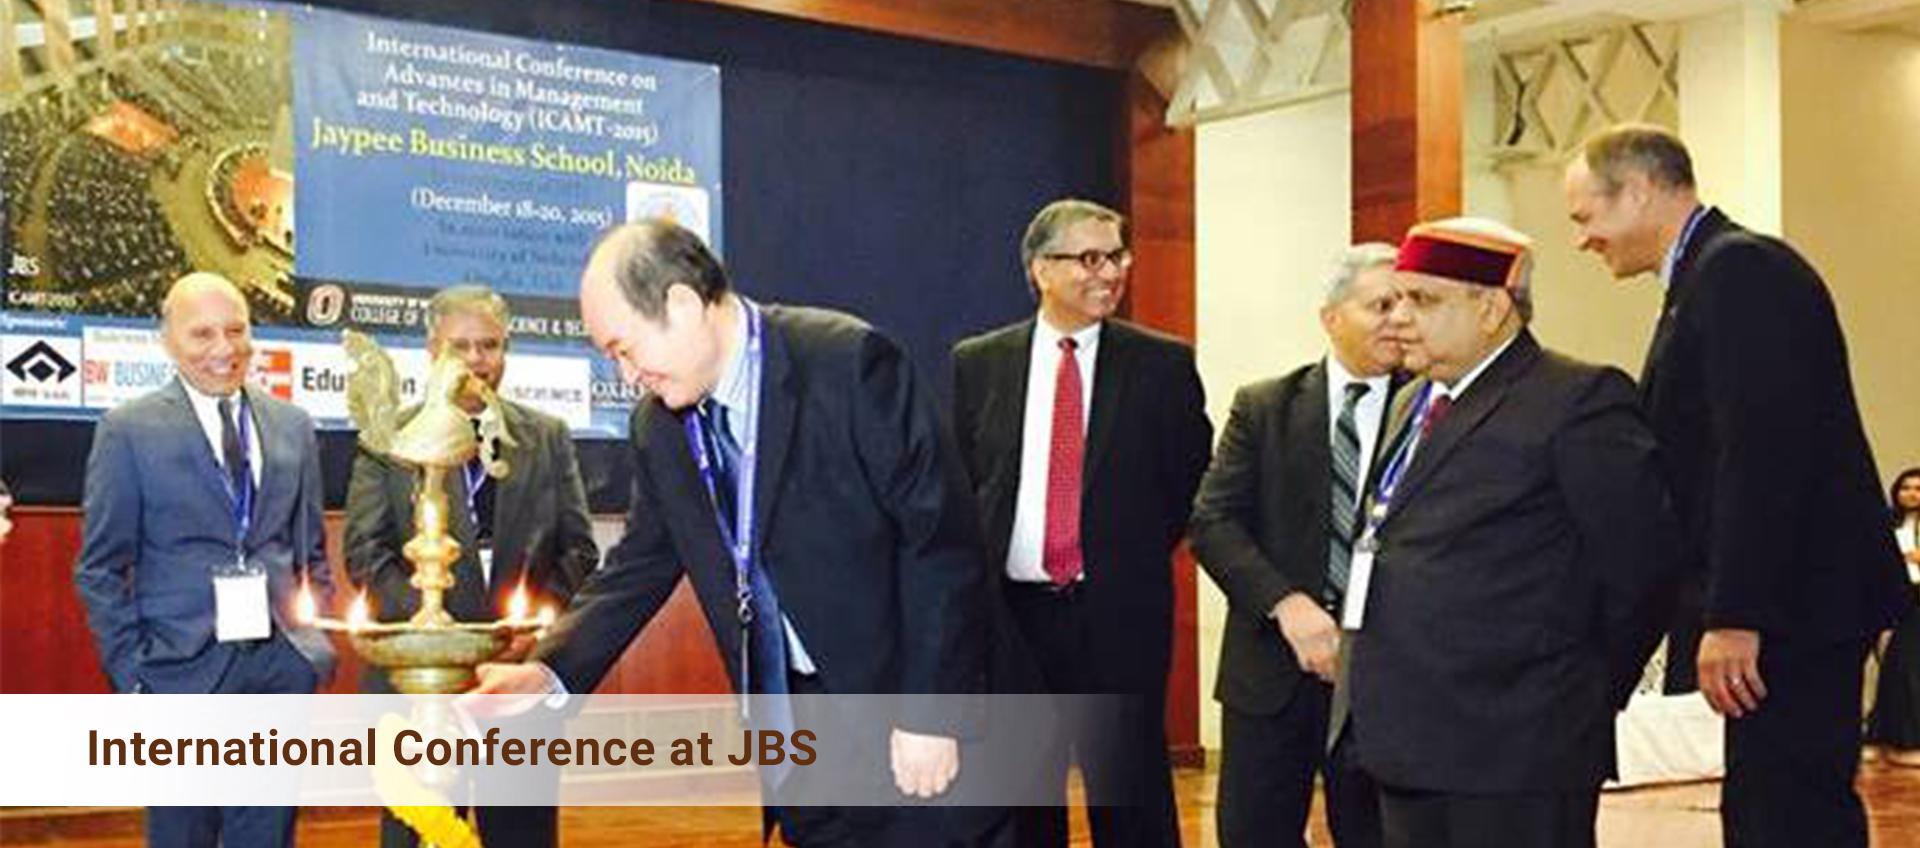 International Conference at JBS